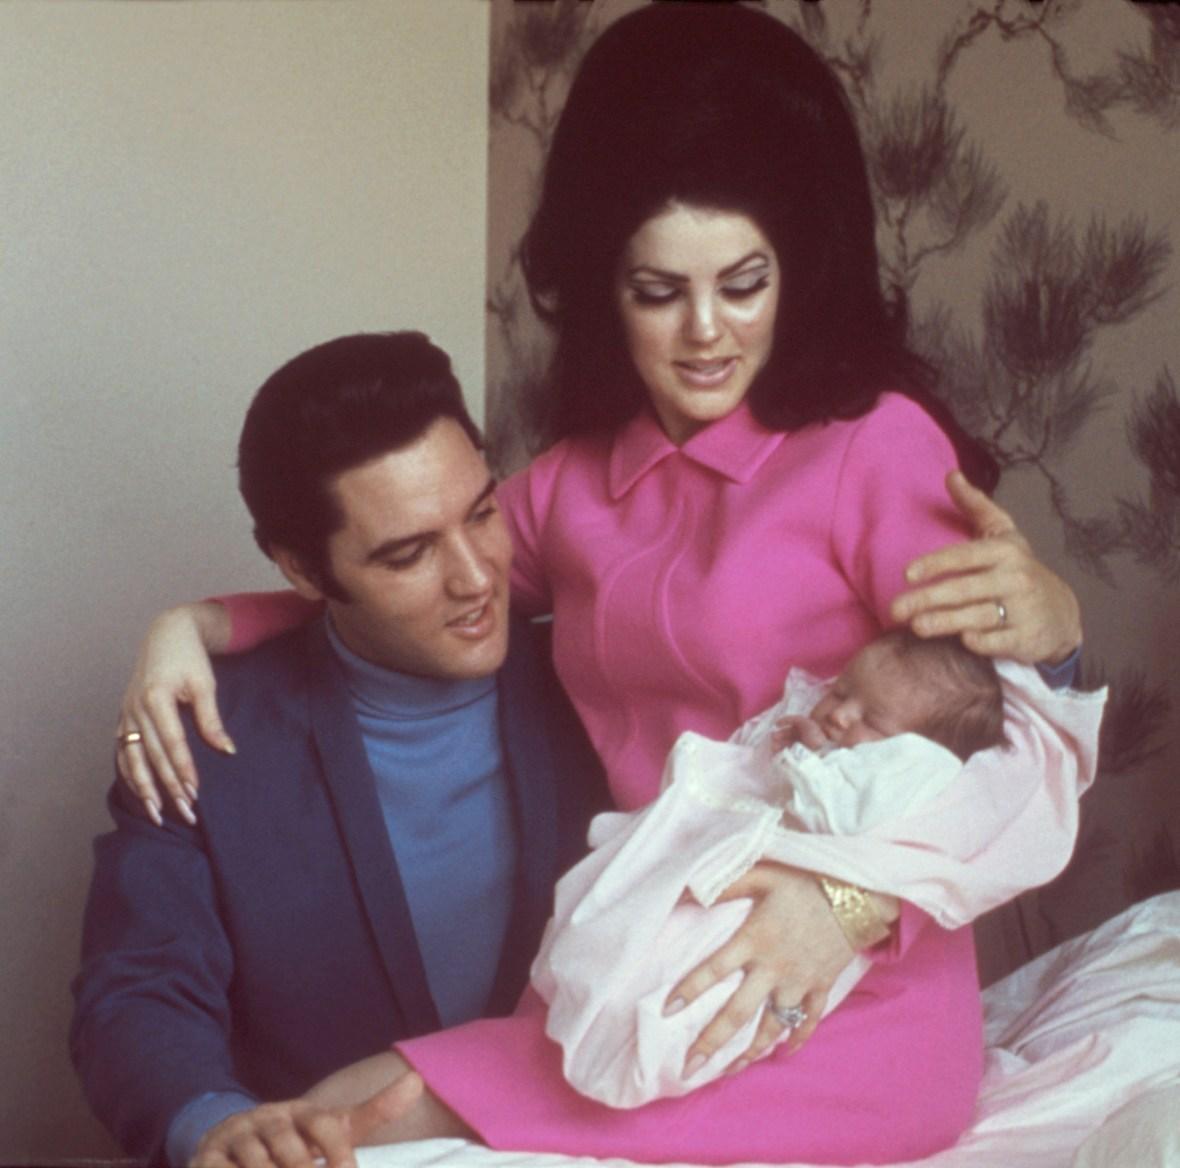 priscilla presley, elvis presley, lisa marie in 1968 getty